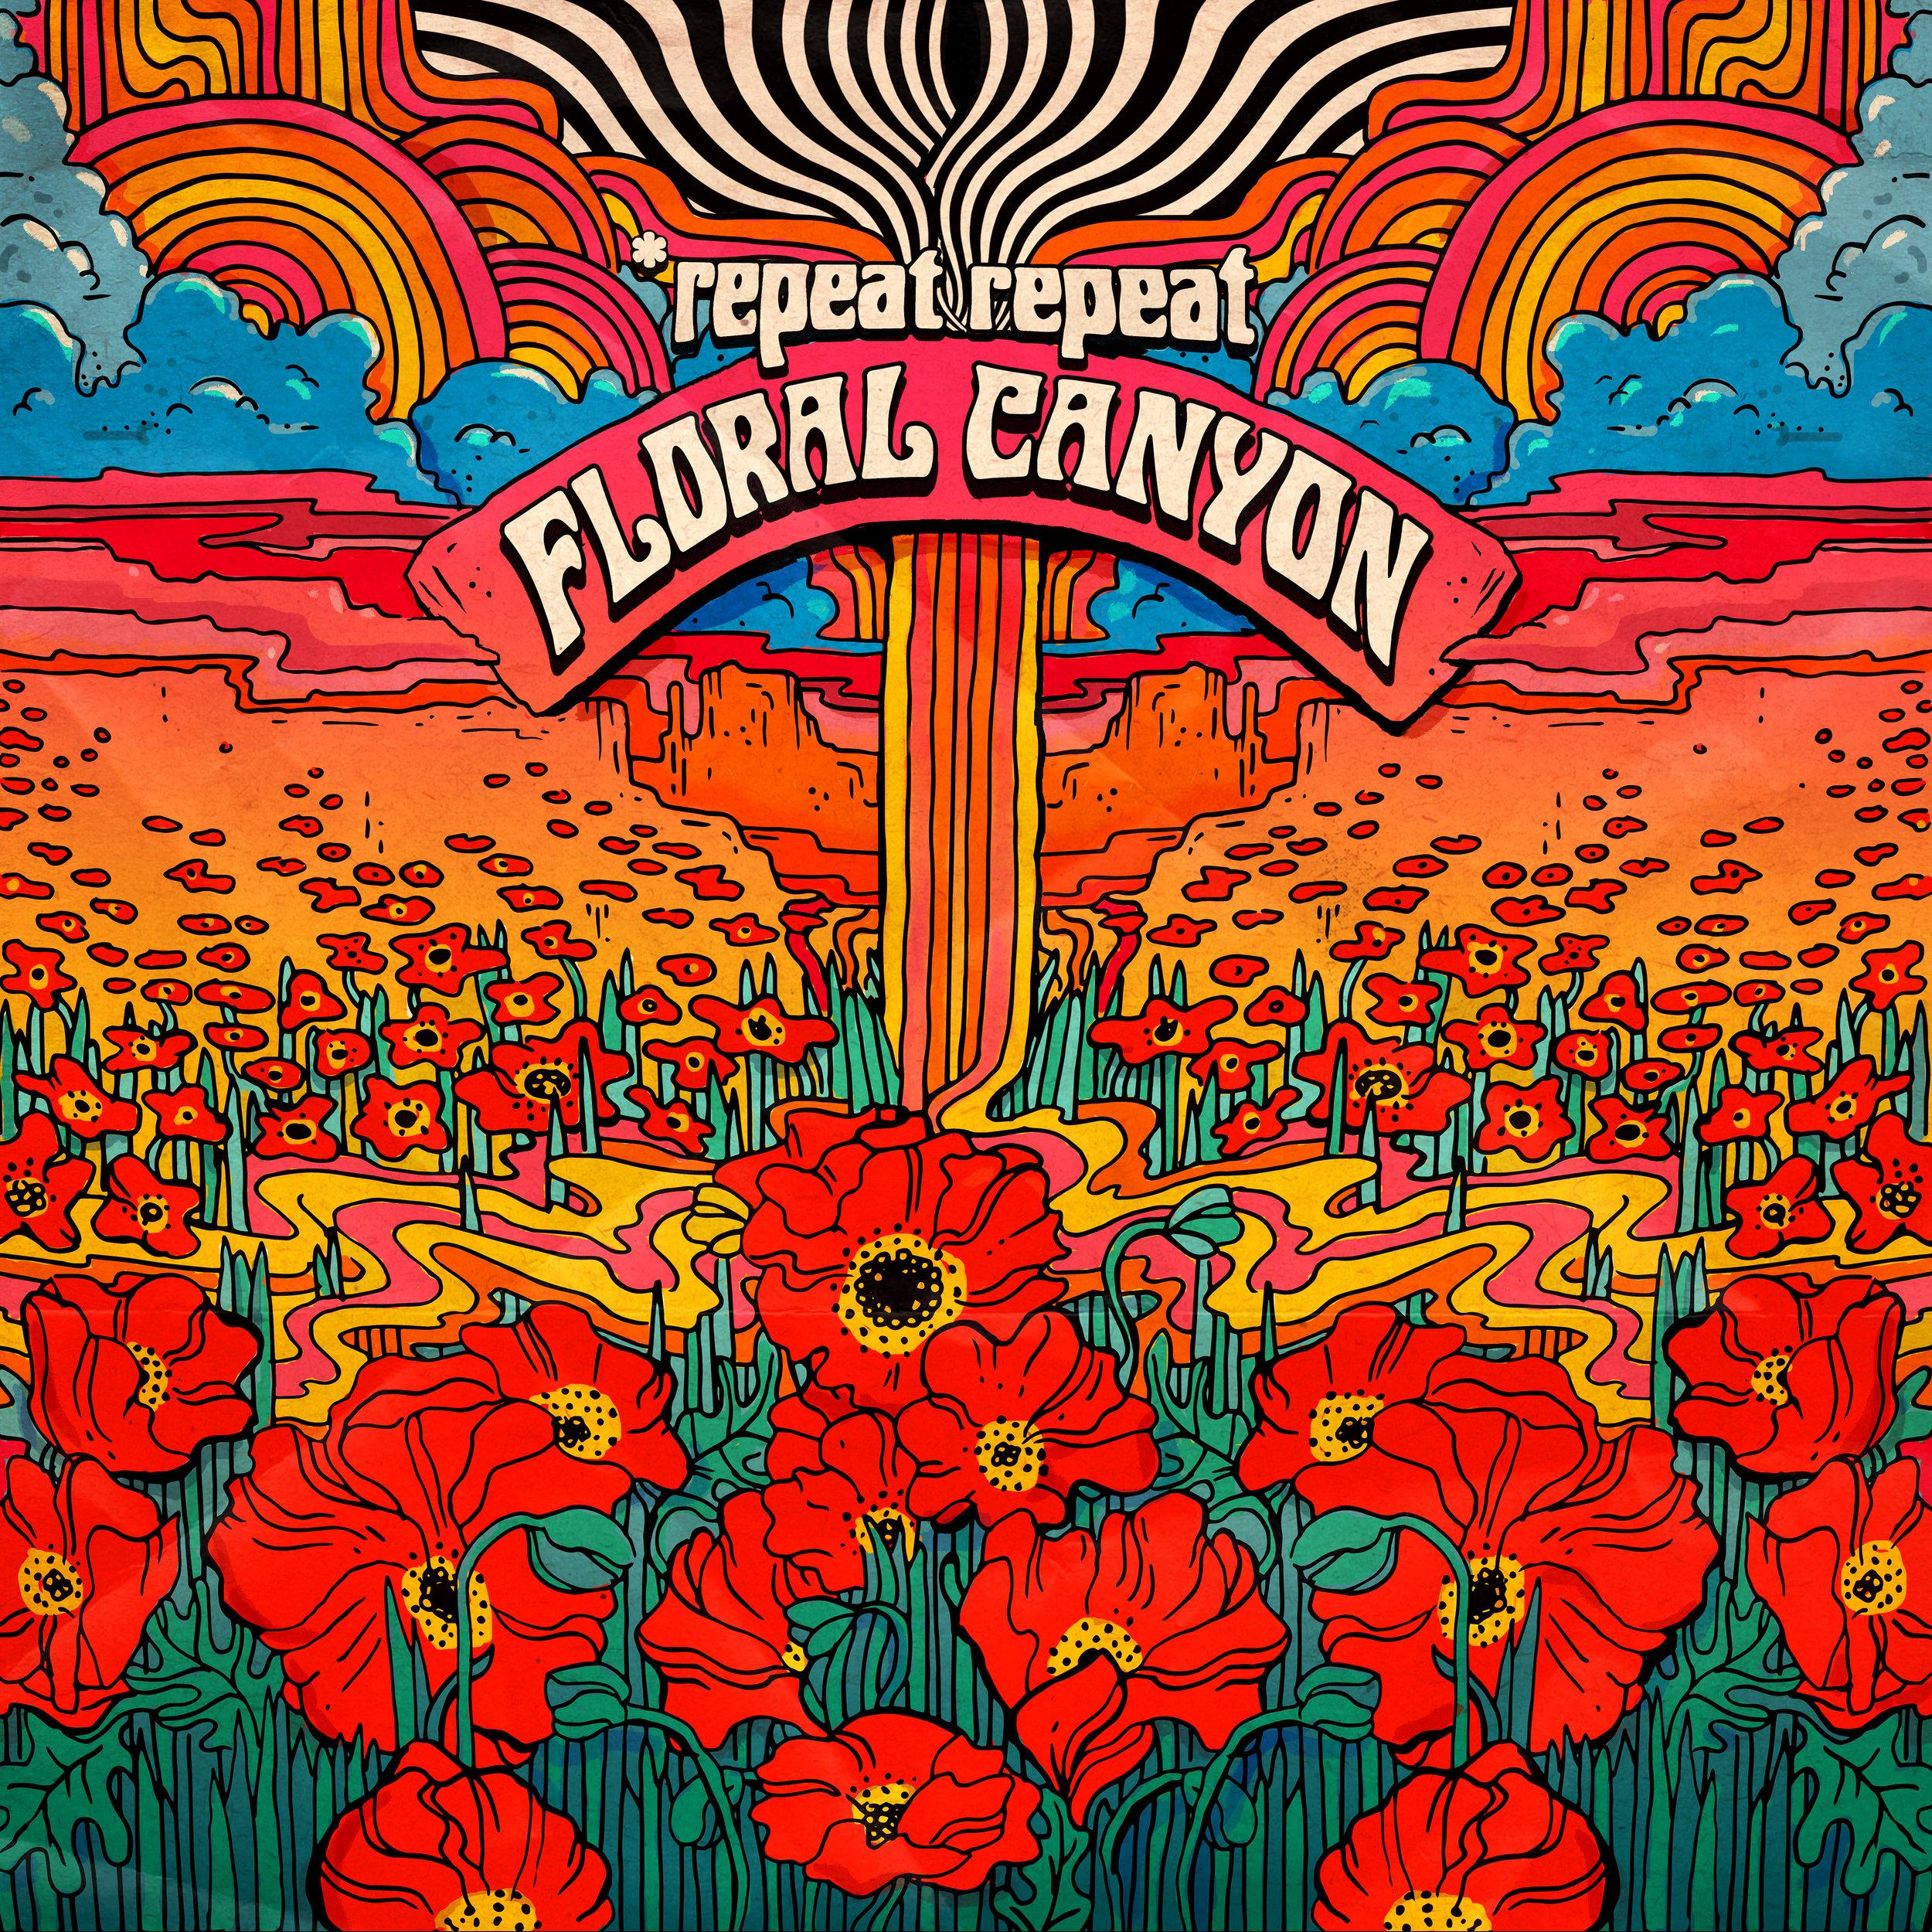 Floral Canyon released on major digital retailers - Snag the sophomore album online